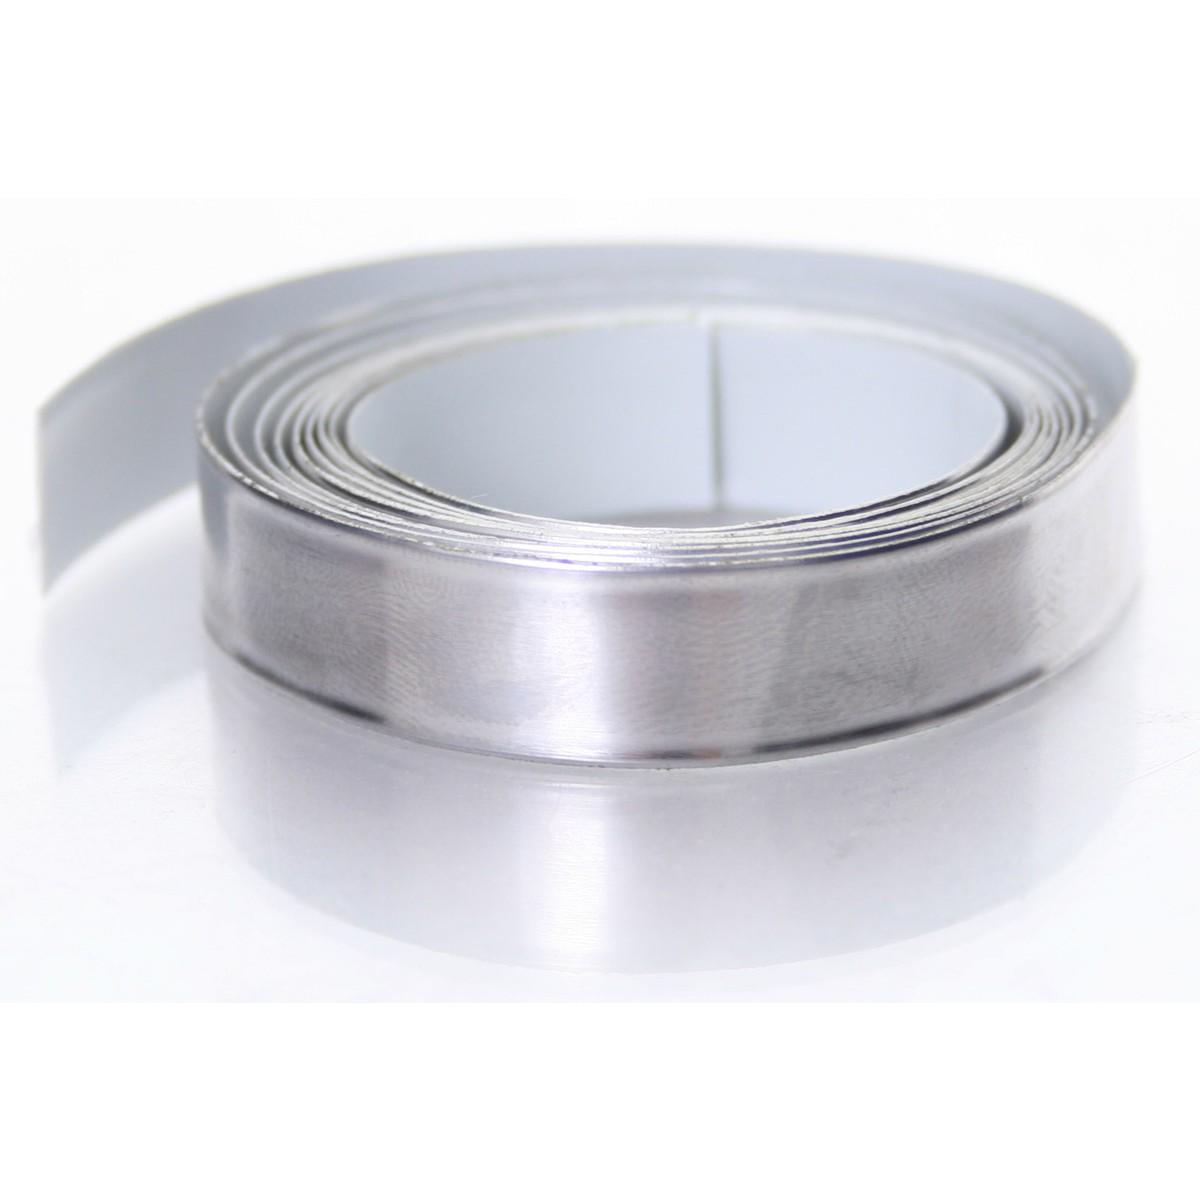 BANDE PLOMBEE 10 grammes (6 mm x 108.5 cm)